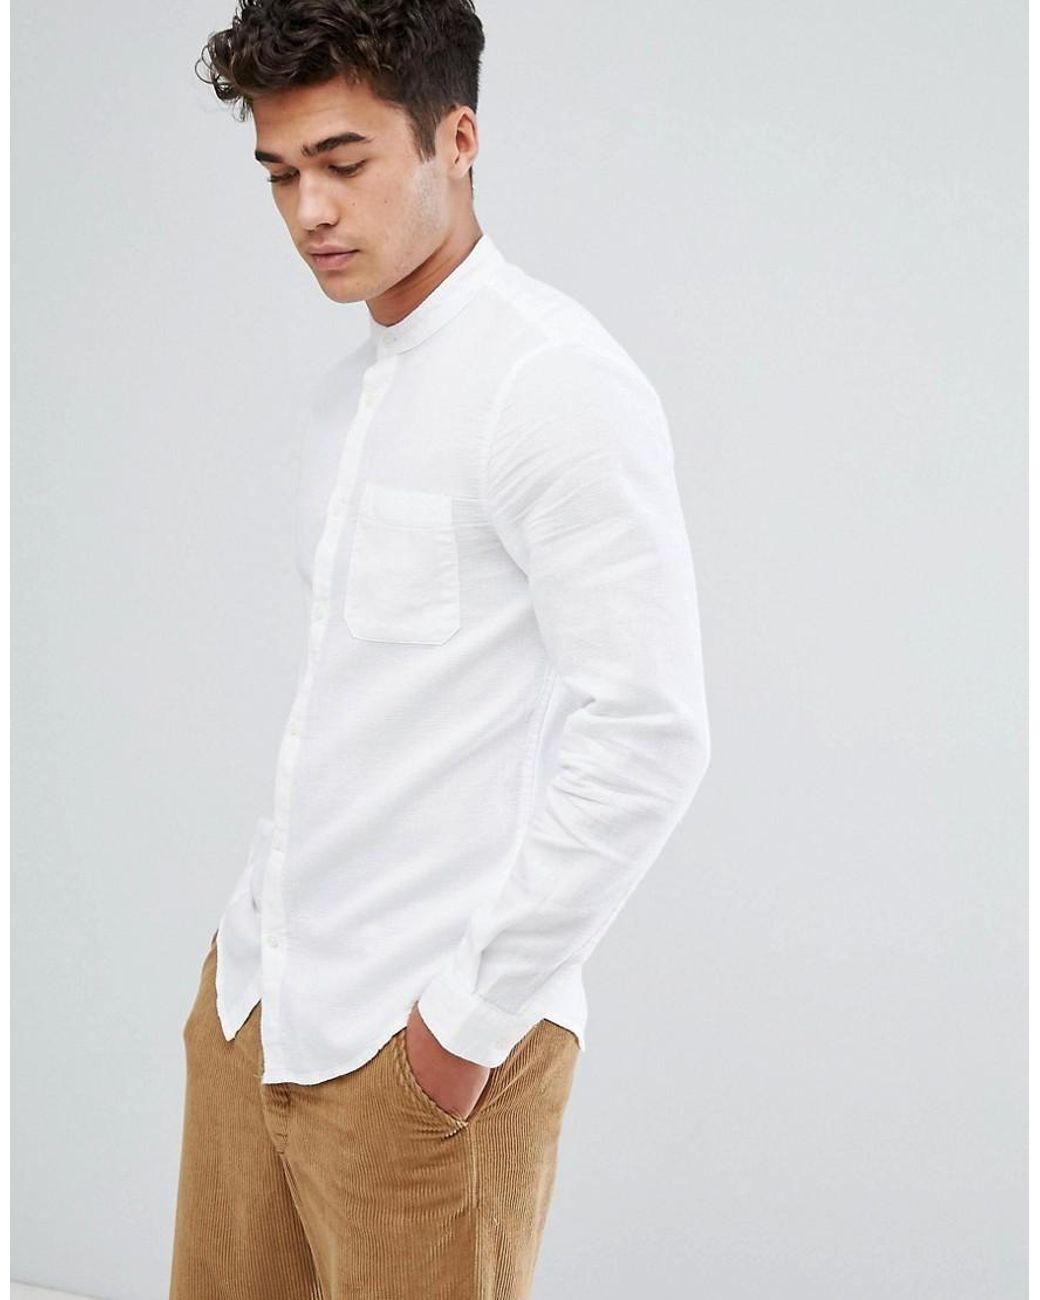 560d8987d Bershka Shirt With Grandad Collar In White in White for Men - Lyst